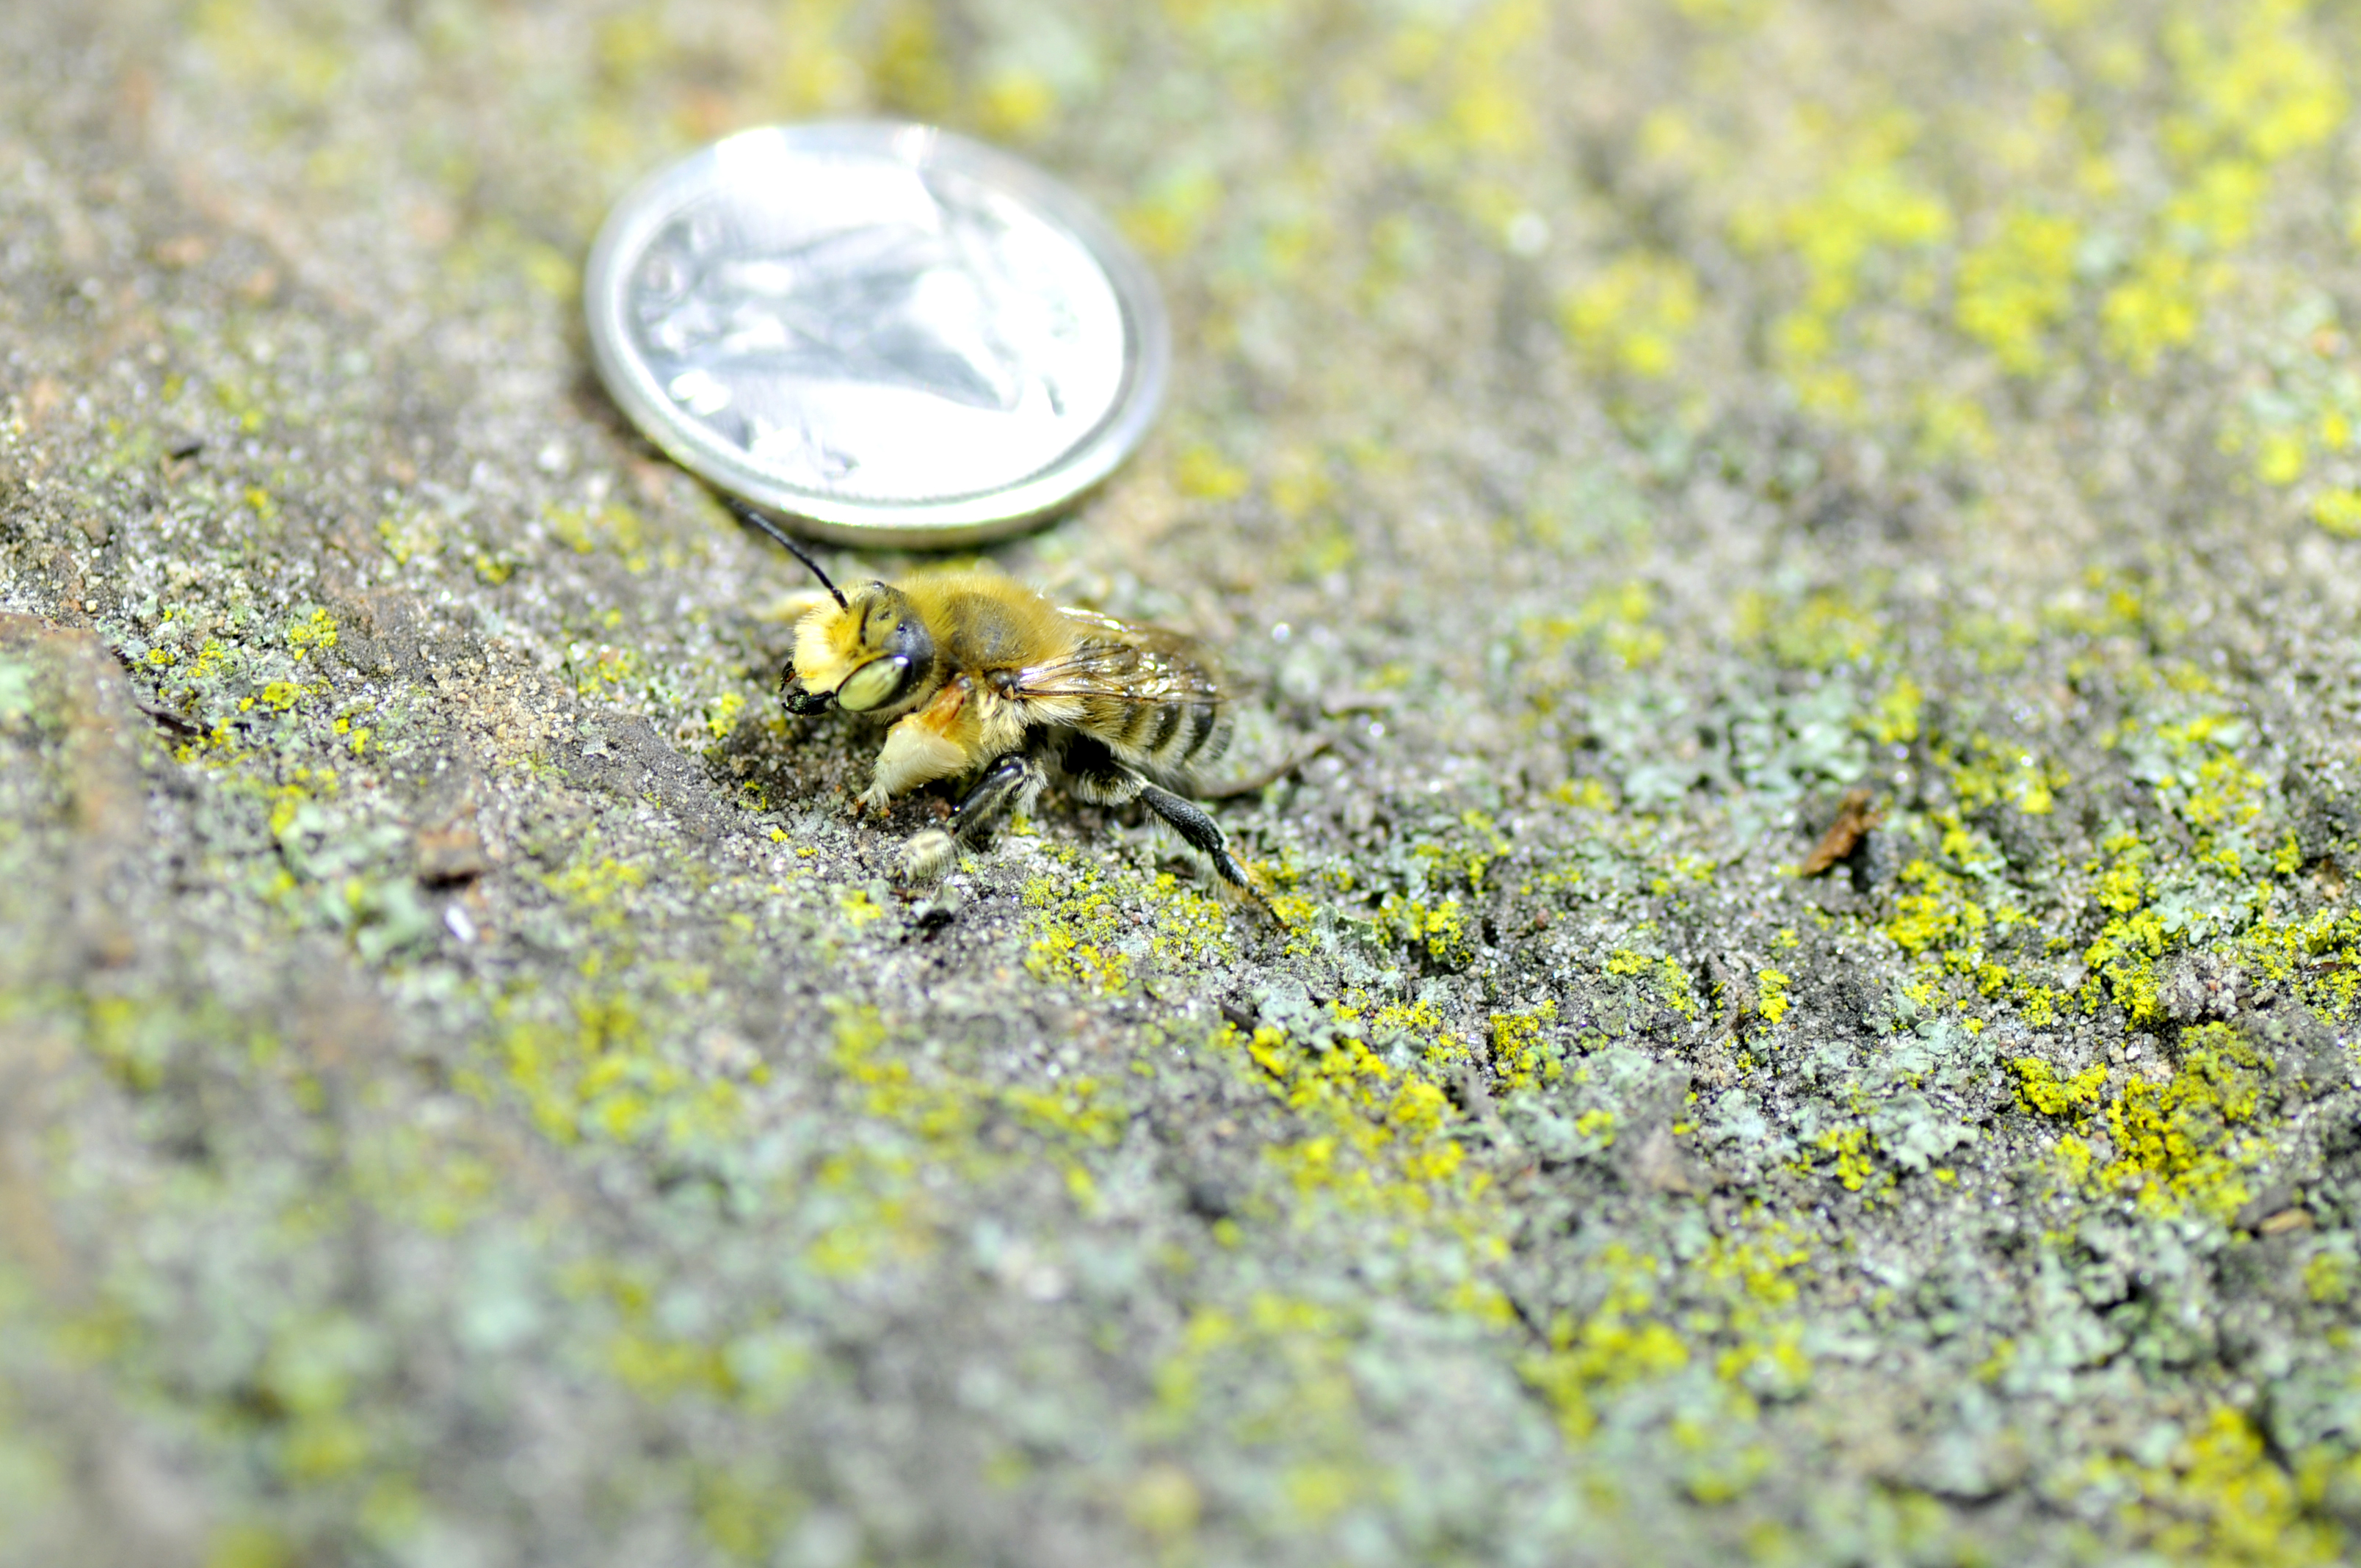 Male leaf-cutter bee